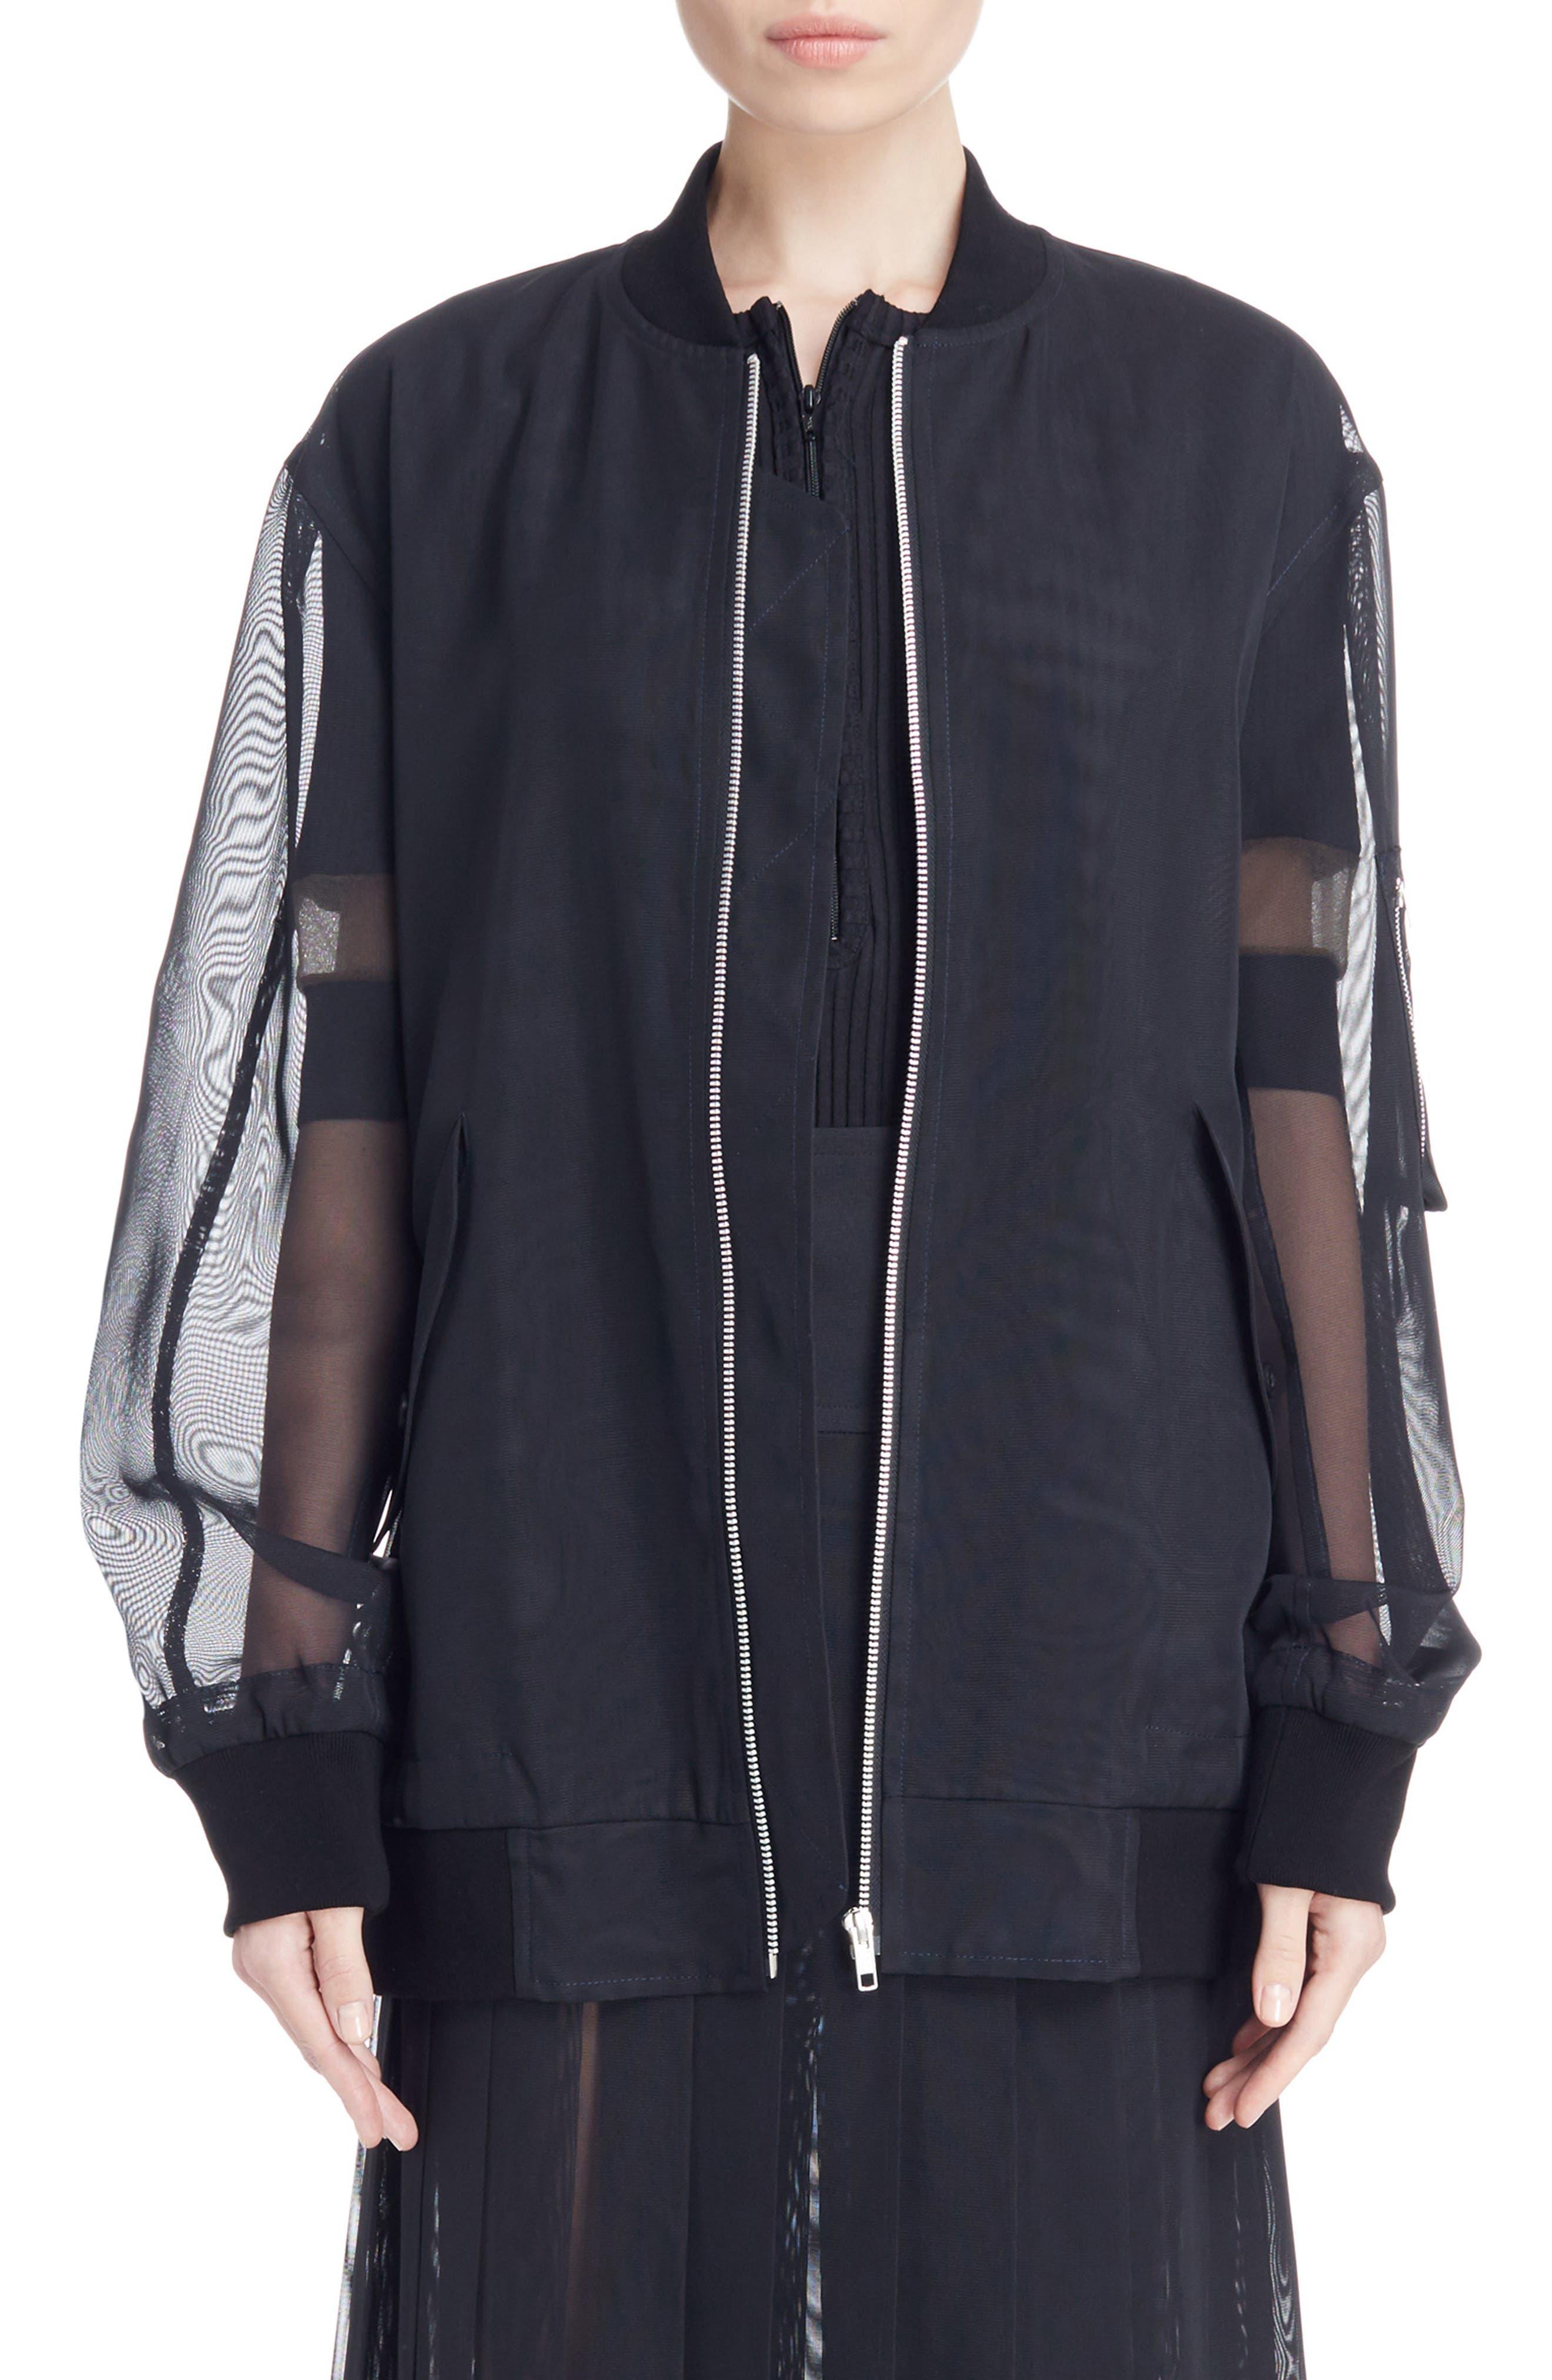 Mesh Bomber Jacket,                         Main,                         color, Black